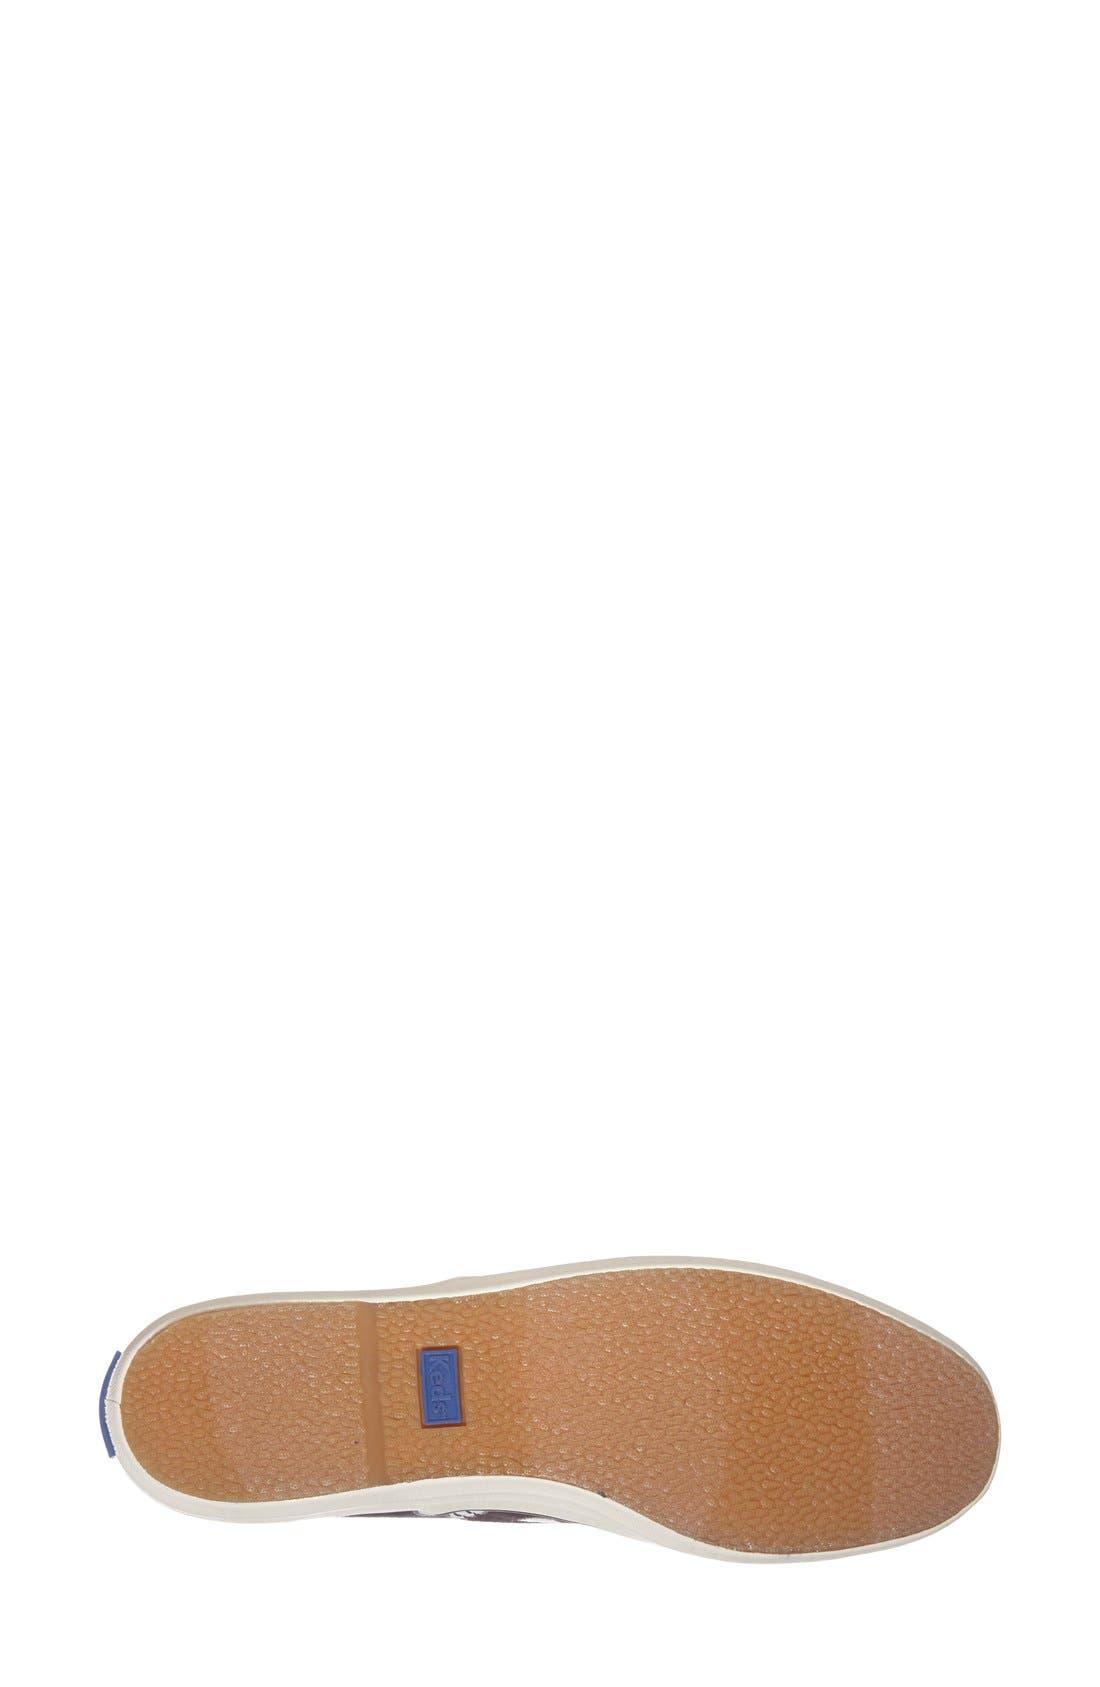 Alternate Image 4  - Keds® 'Champion - Glitter Dot' Canvas Sneaker (Women) (Regular Retail Price: $49.95)